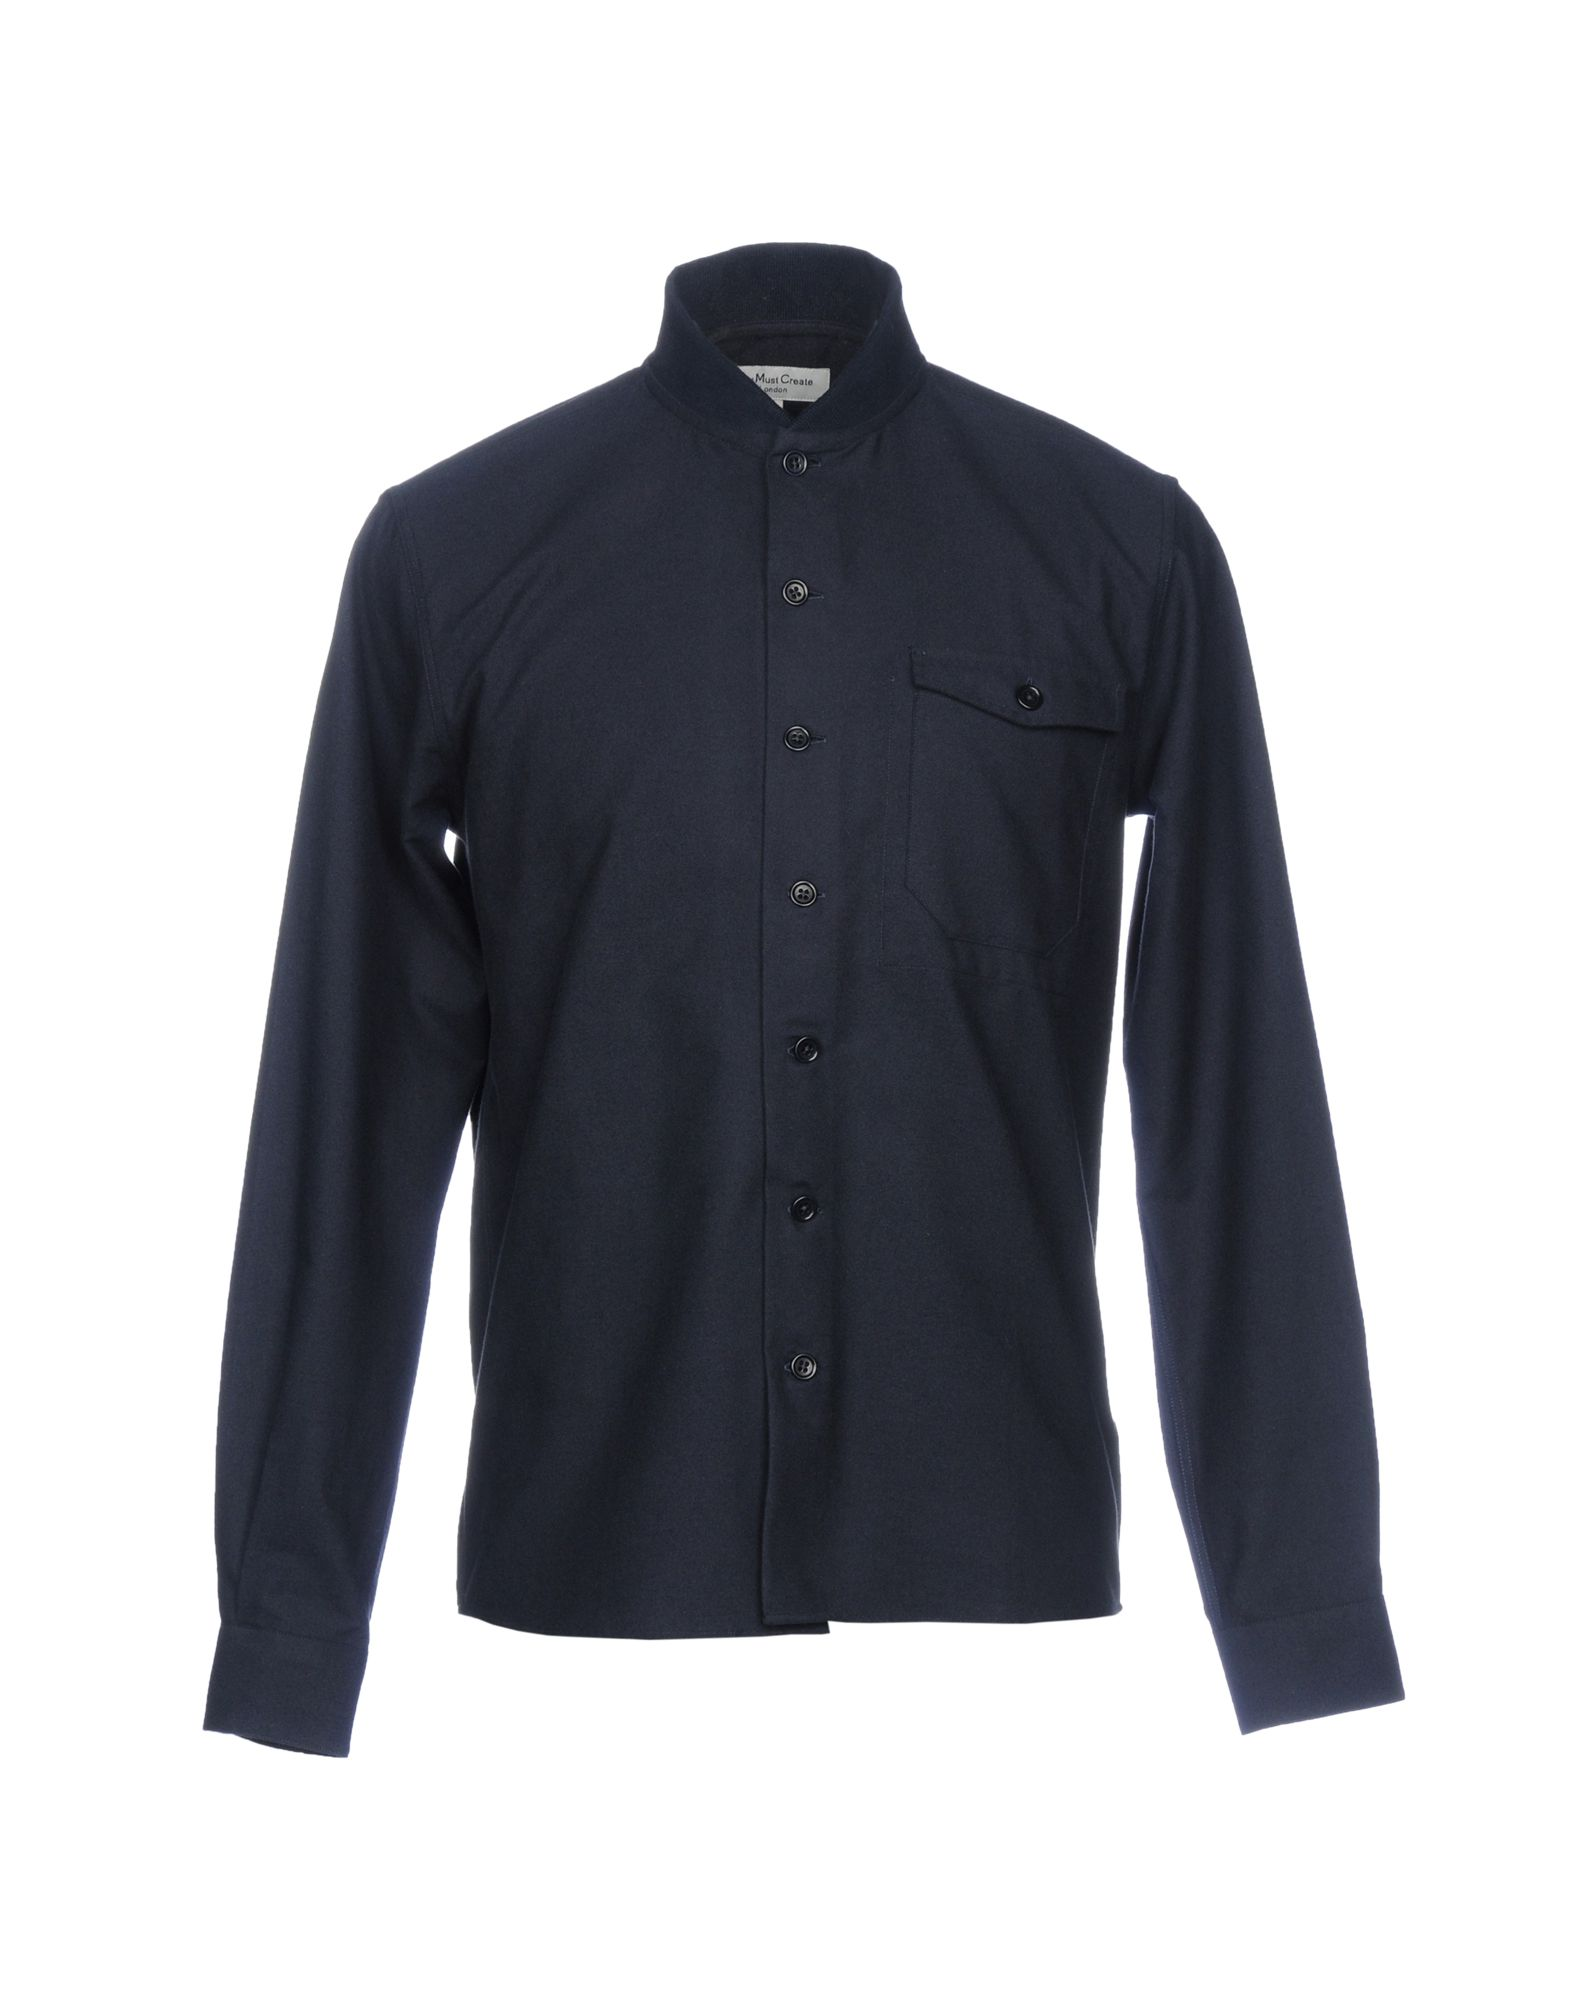 YMC YOU MUST CREATE Pубашка цены онлайн